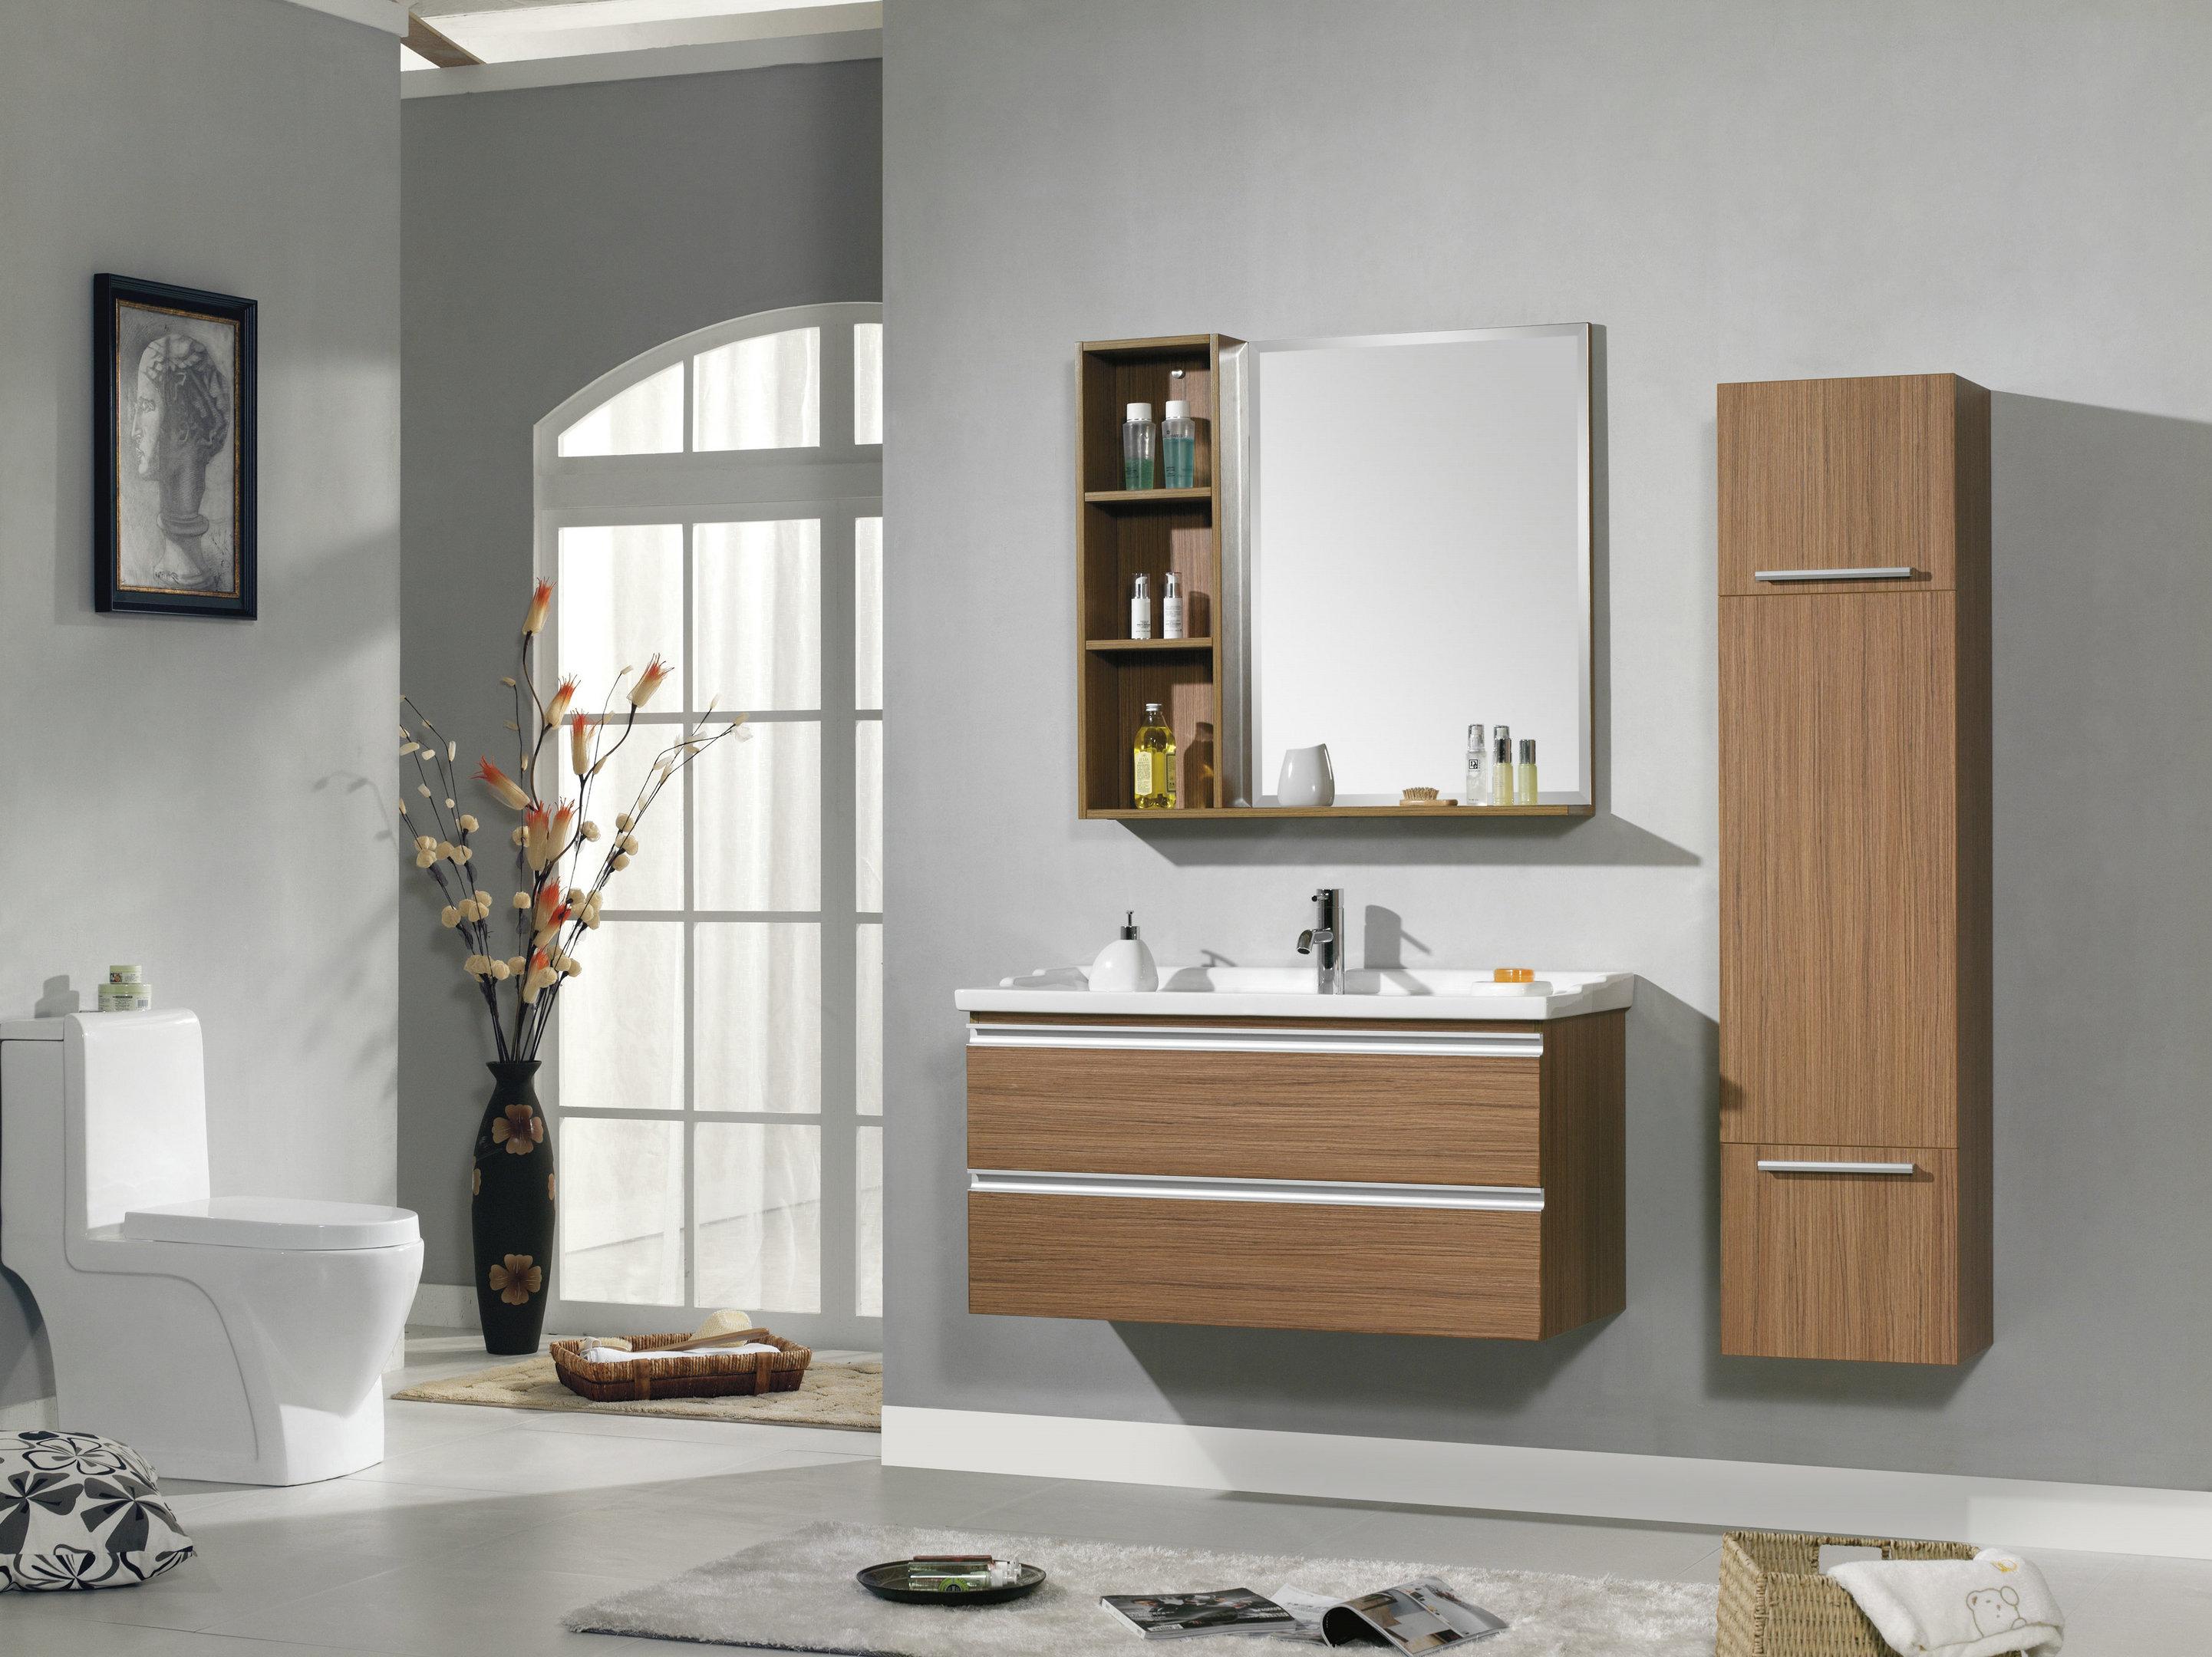 Meuble salle de bain luxe x 8005 nouvelle ceramique - Meuble salle de bain luxe ...